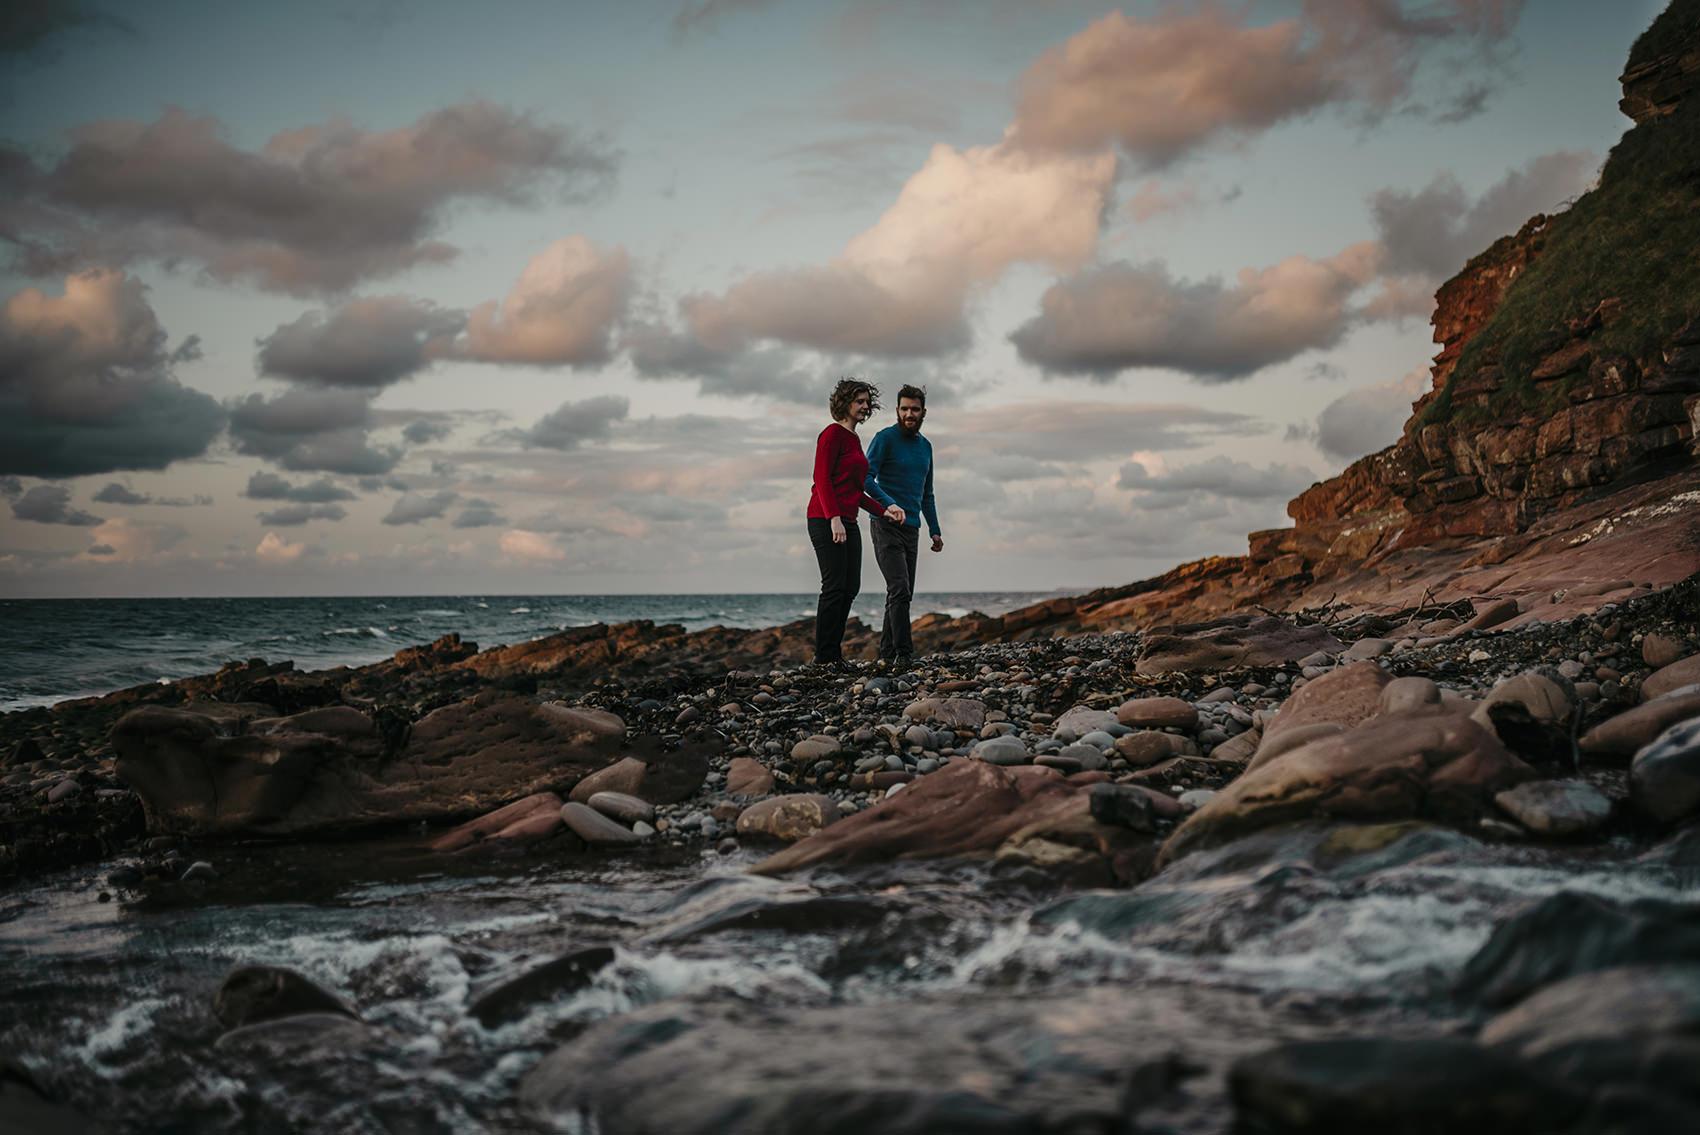 windswept sunset engagement photoshoot on a beach near Peel, Isle of Man